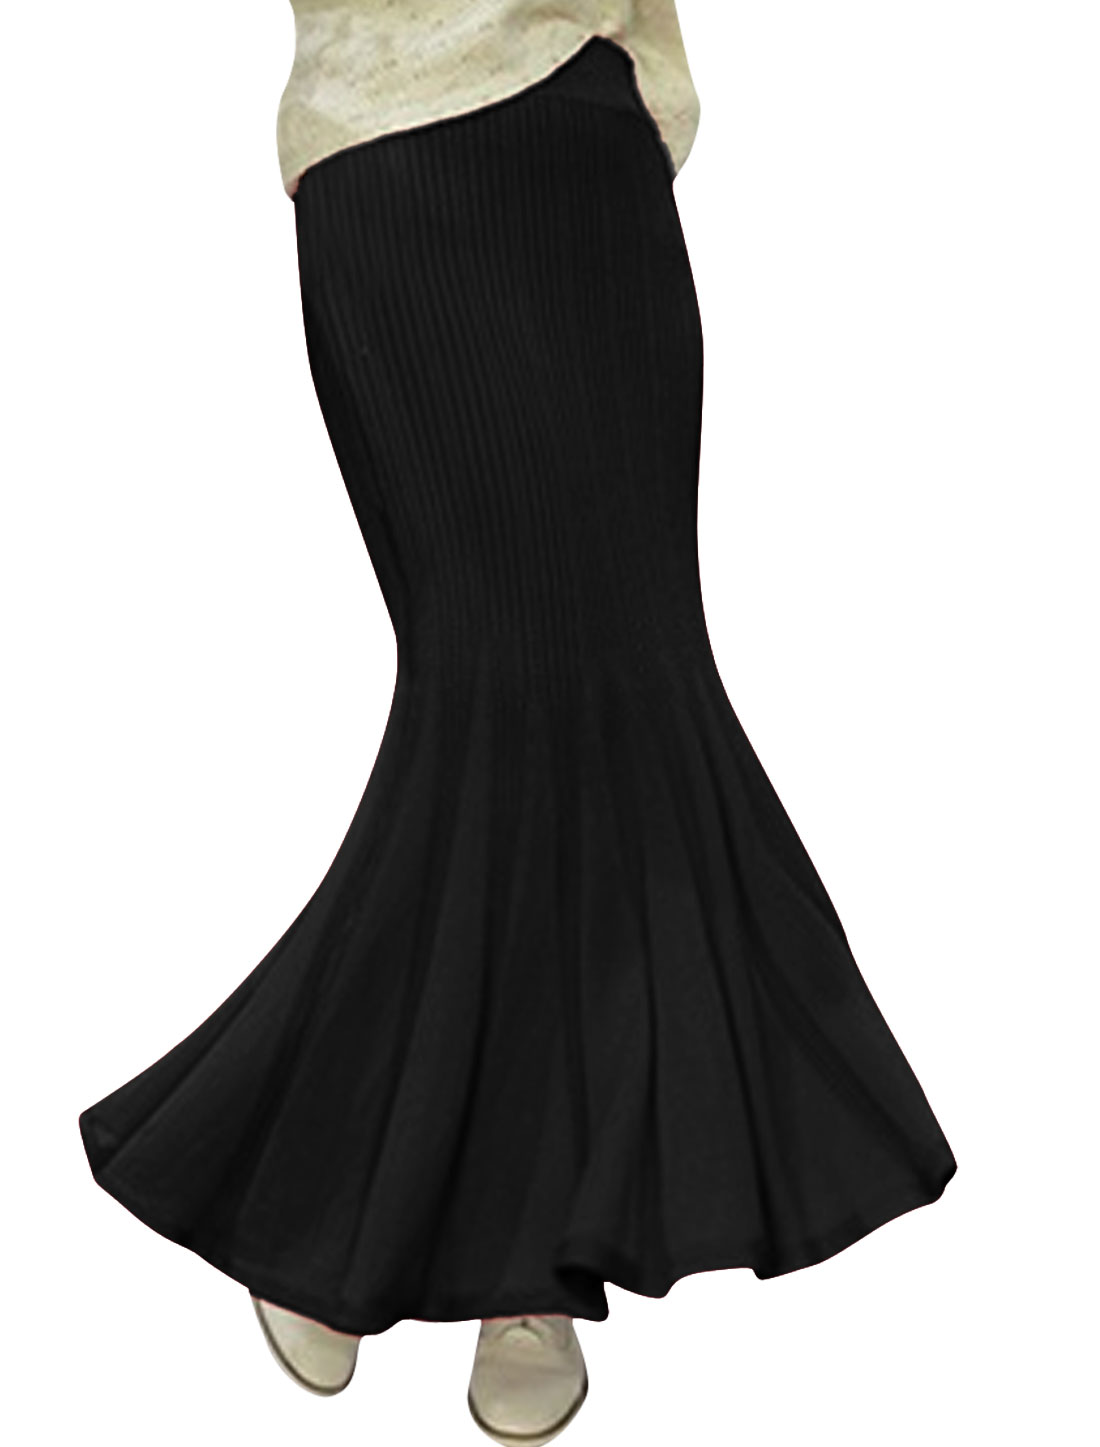 Lady Elastic Waist Ruffled Hem Leisure Maxi Skirt Black XS